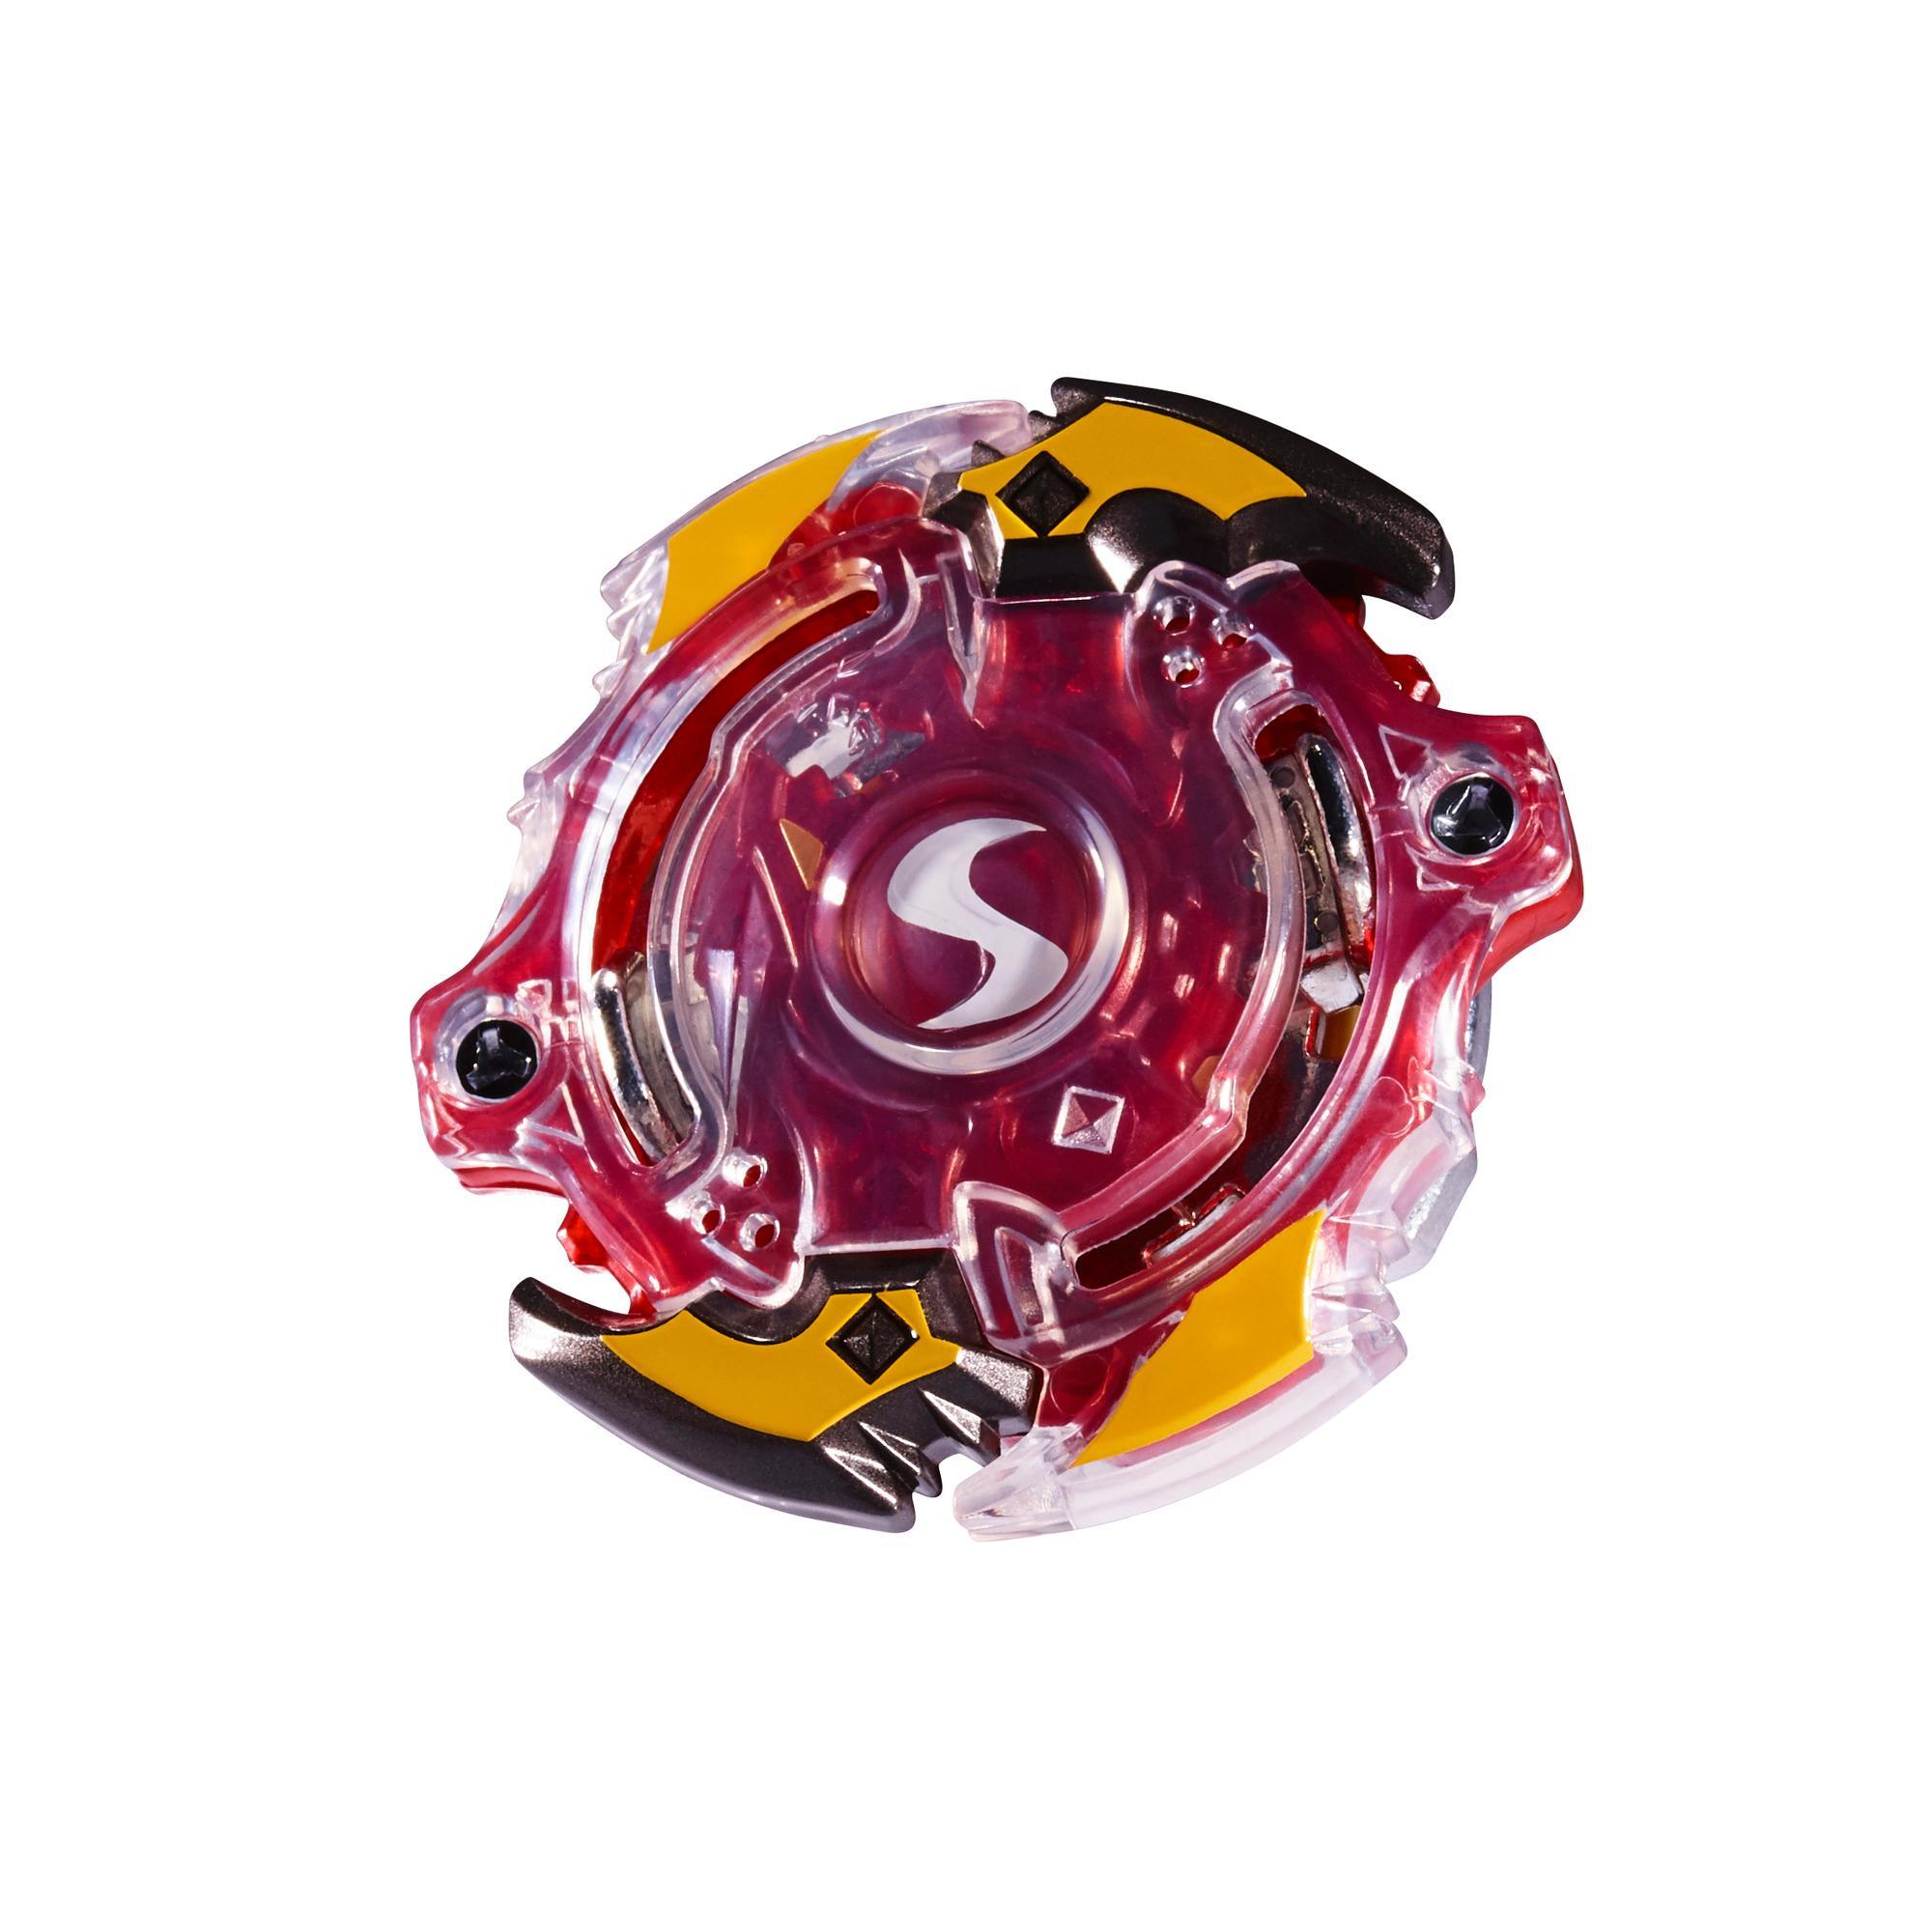 Beyblade Burst Starter Pack Spryzen S2